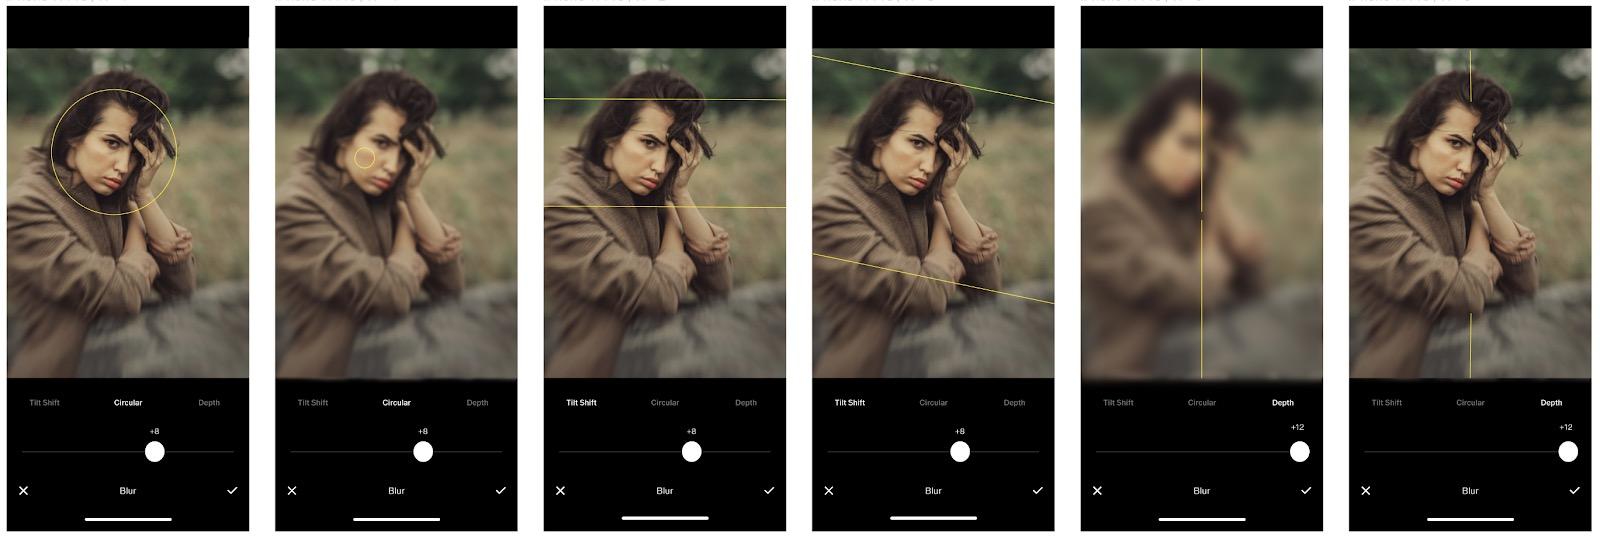 VSCO blur tool screenshots